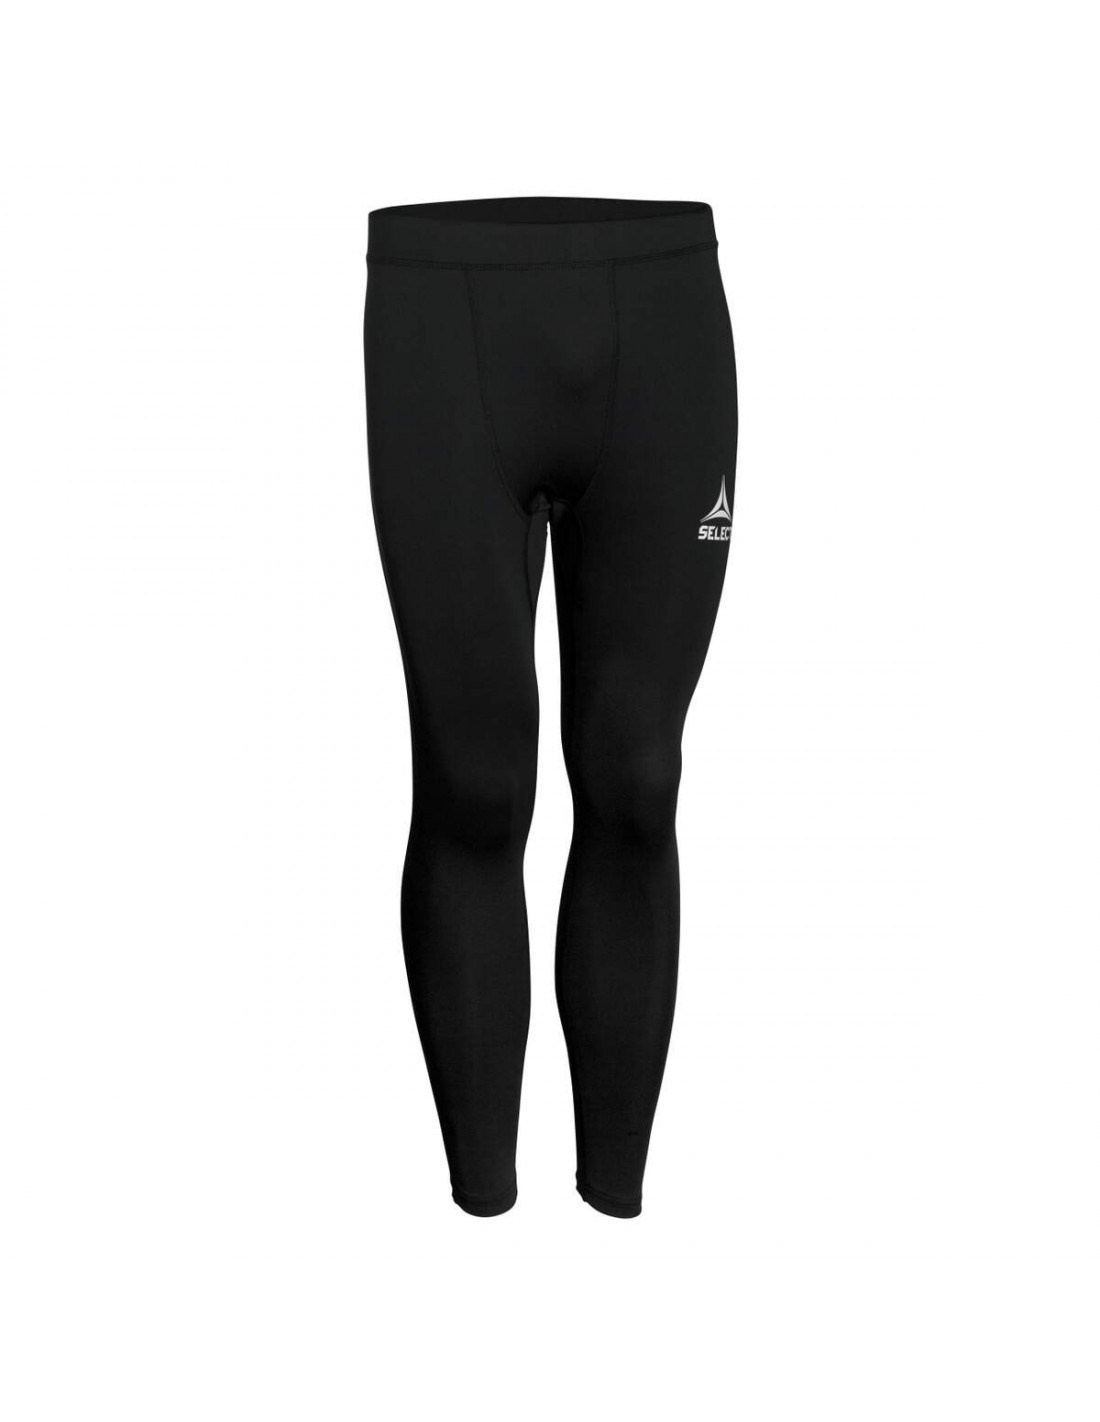 Treningstights Damer Select Tights Pants Baselayer Unisex 660010 550 kr